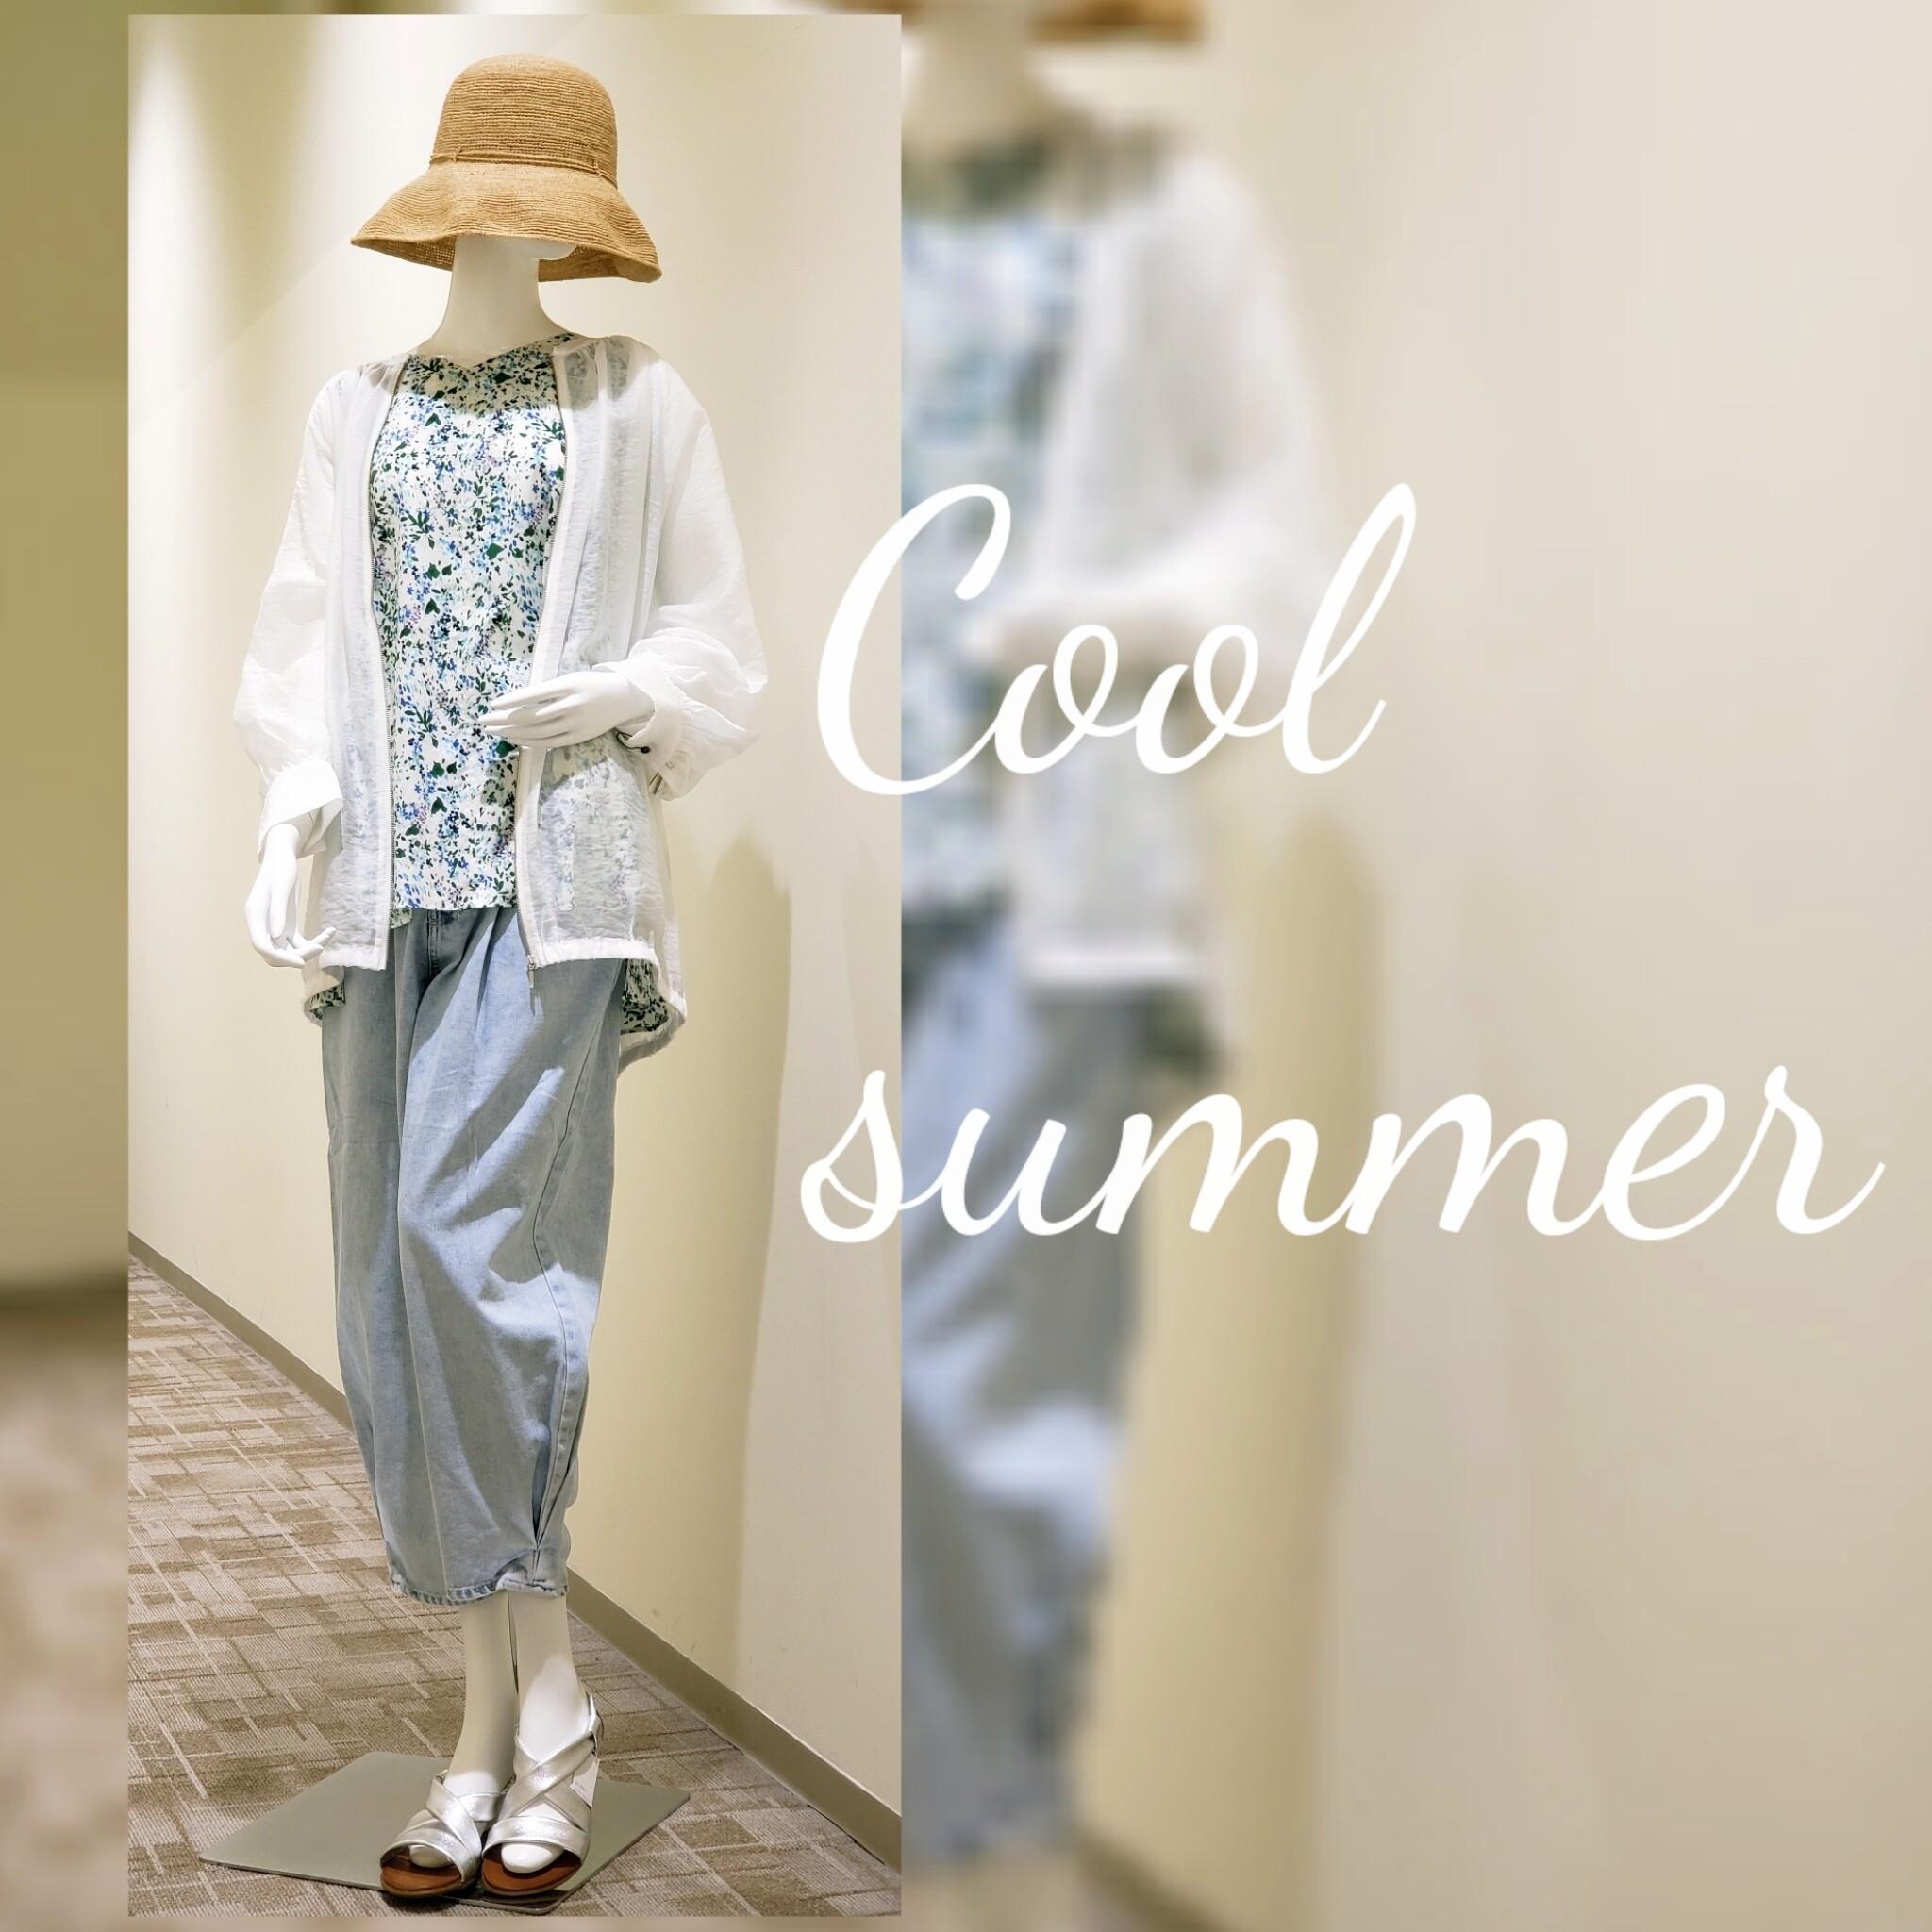 『Cool summer』貴女が通ればもう...そこは避暑地♪